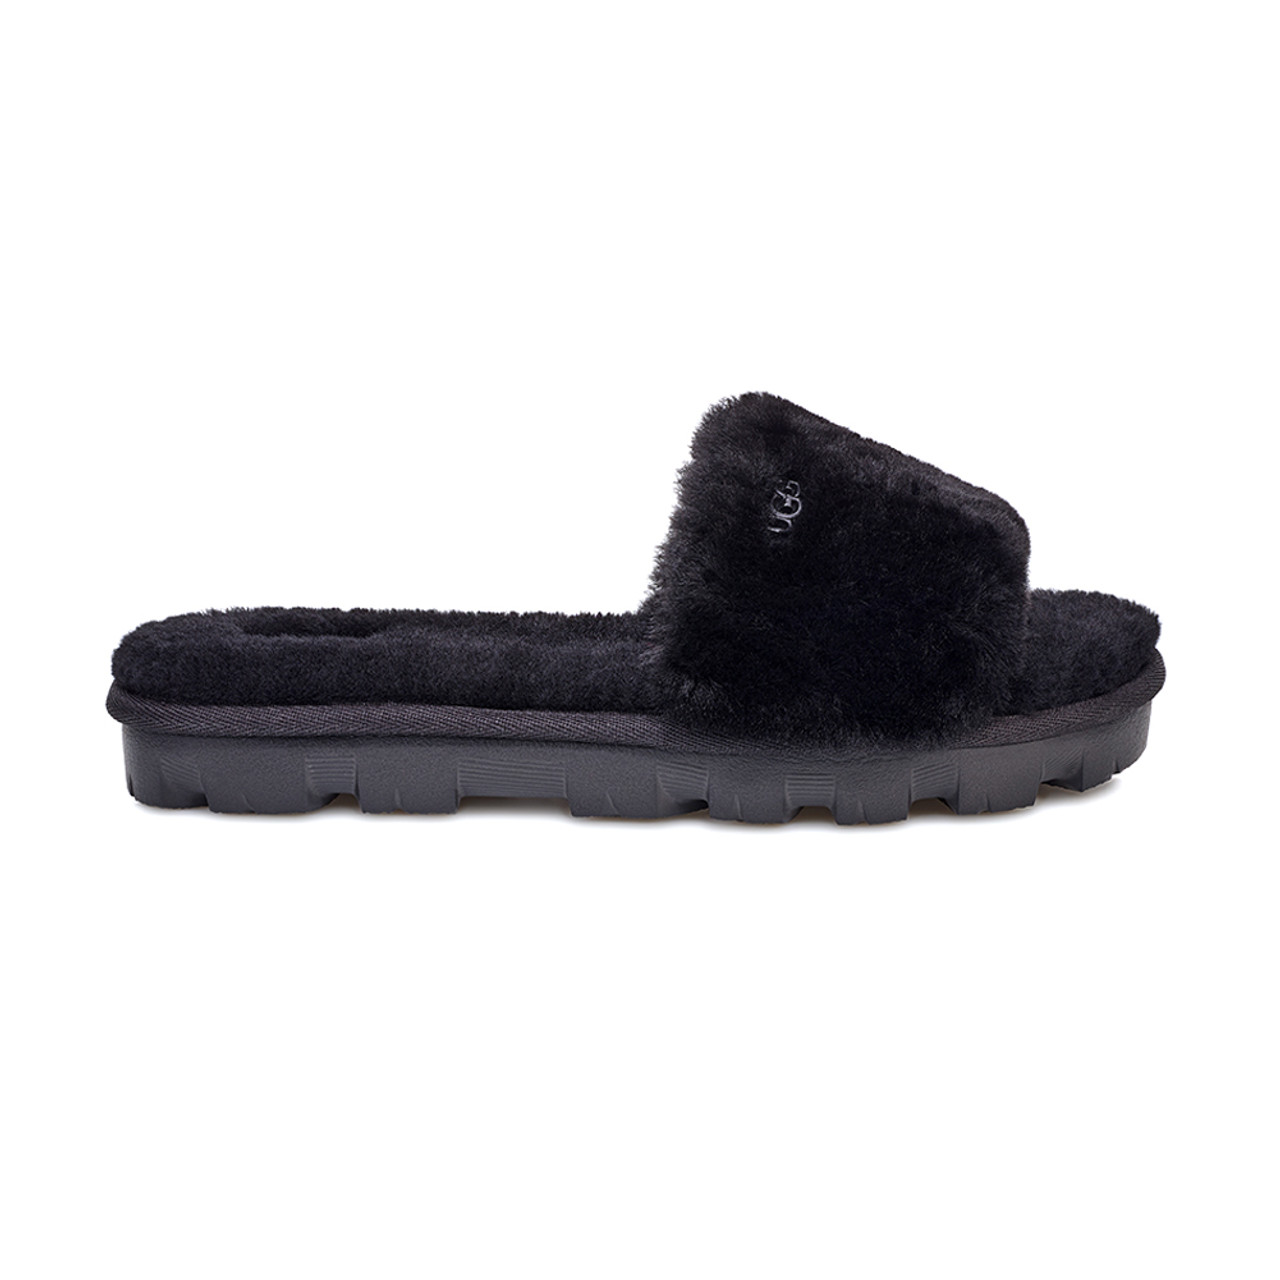 260510a6a63 UGG Women's Cozette Slide Slipper Black